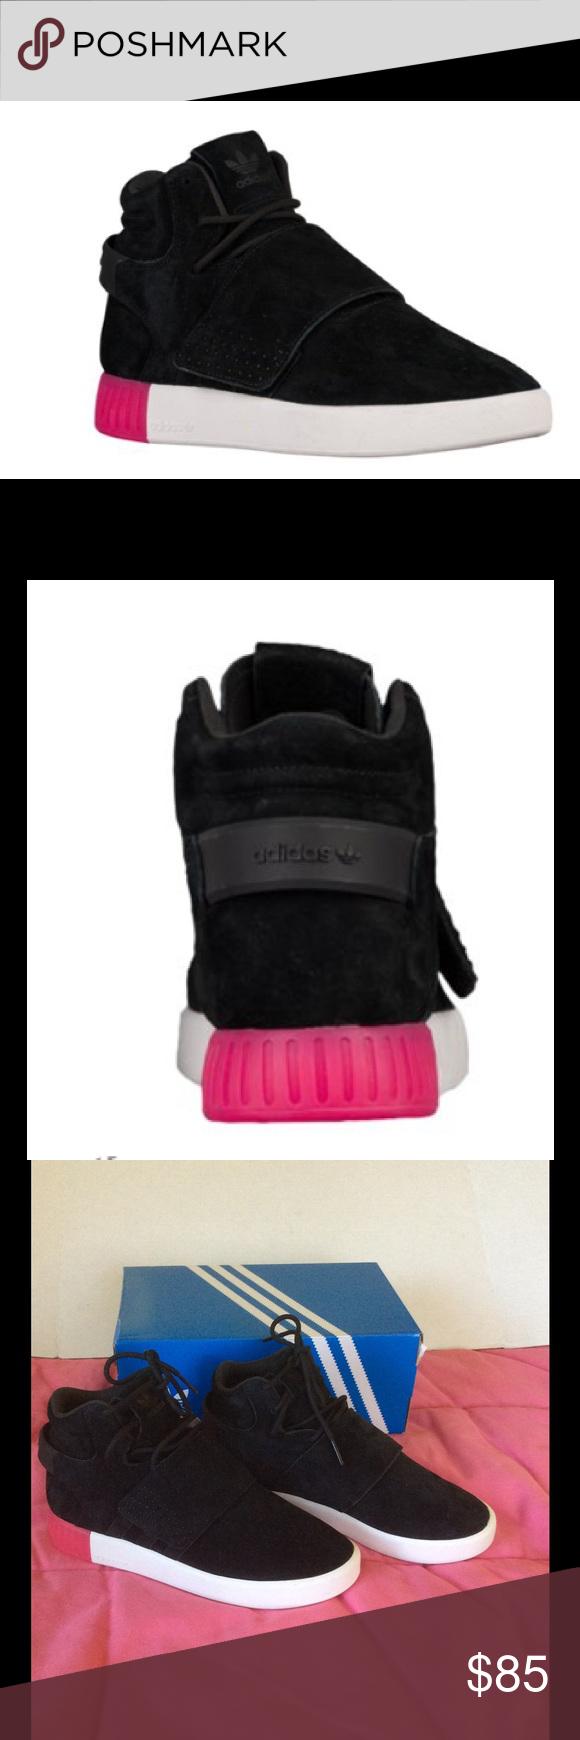 adidas originali tubulare invasore cinghia nero / rosa le adidas